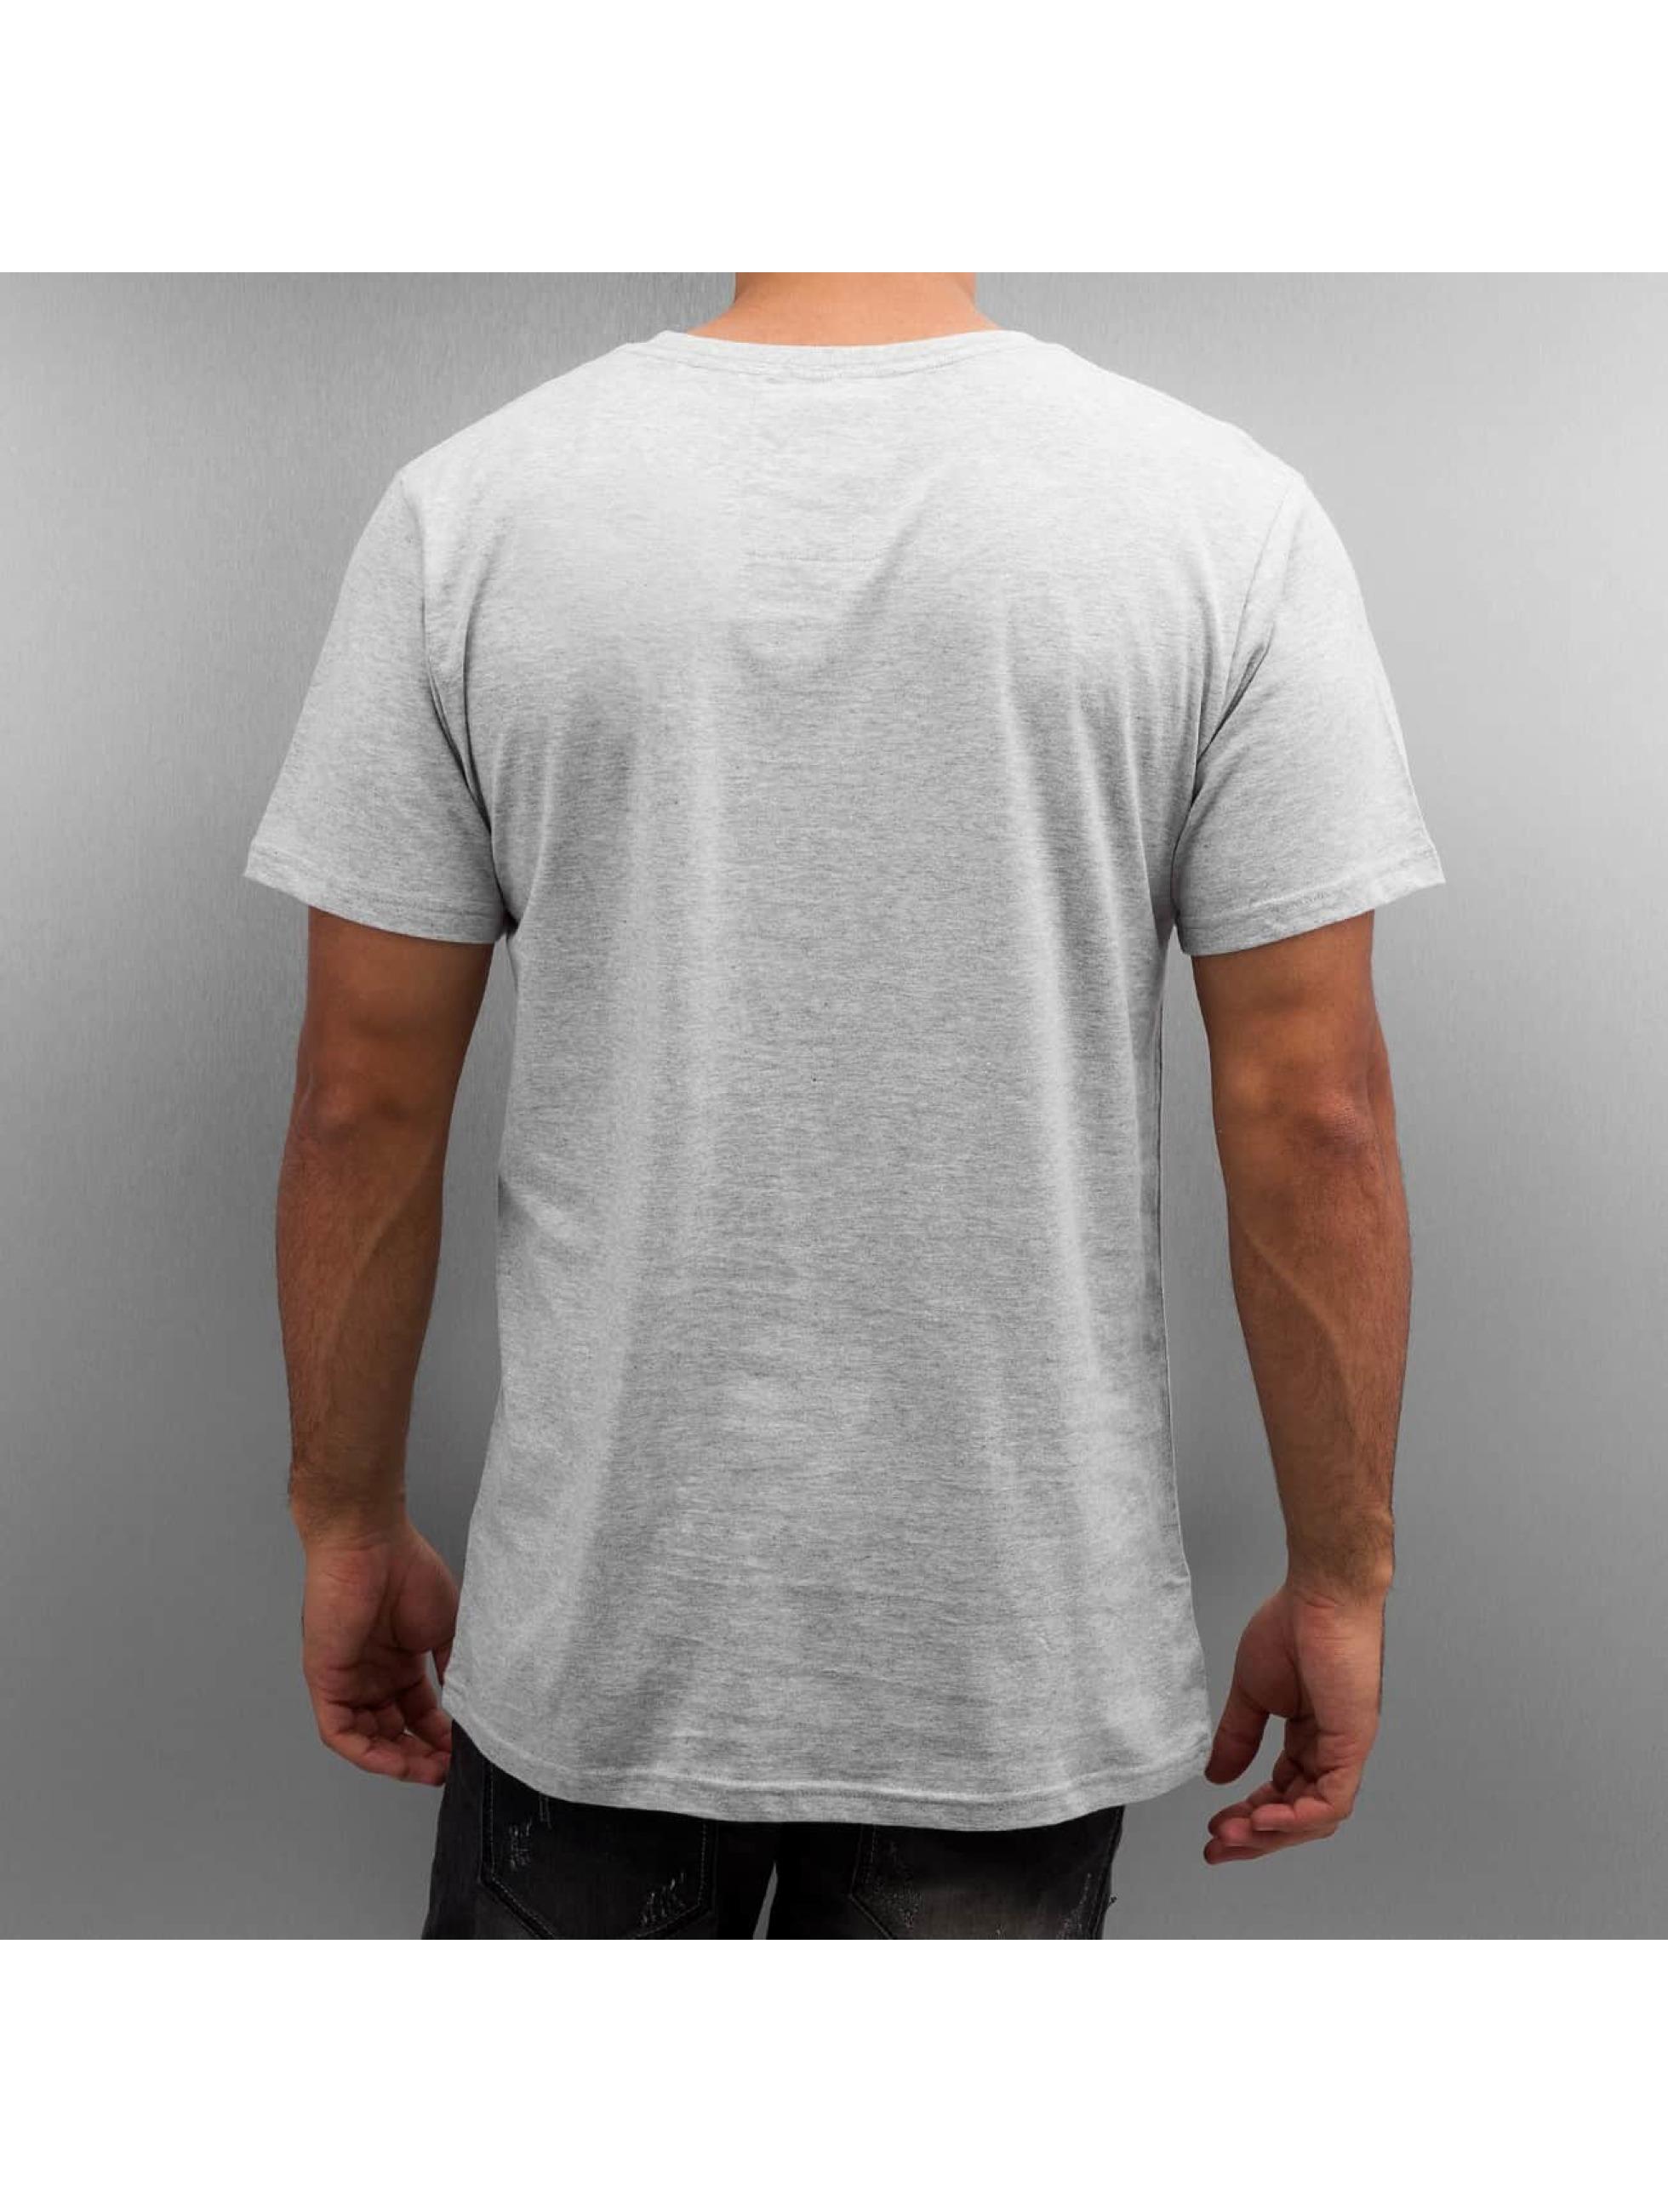 DEDICATED t-shirt Stockholm Mountain Script grijs